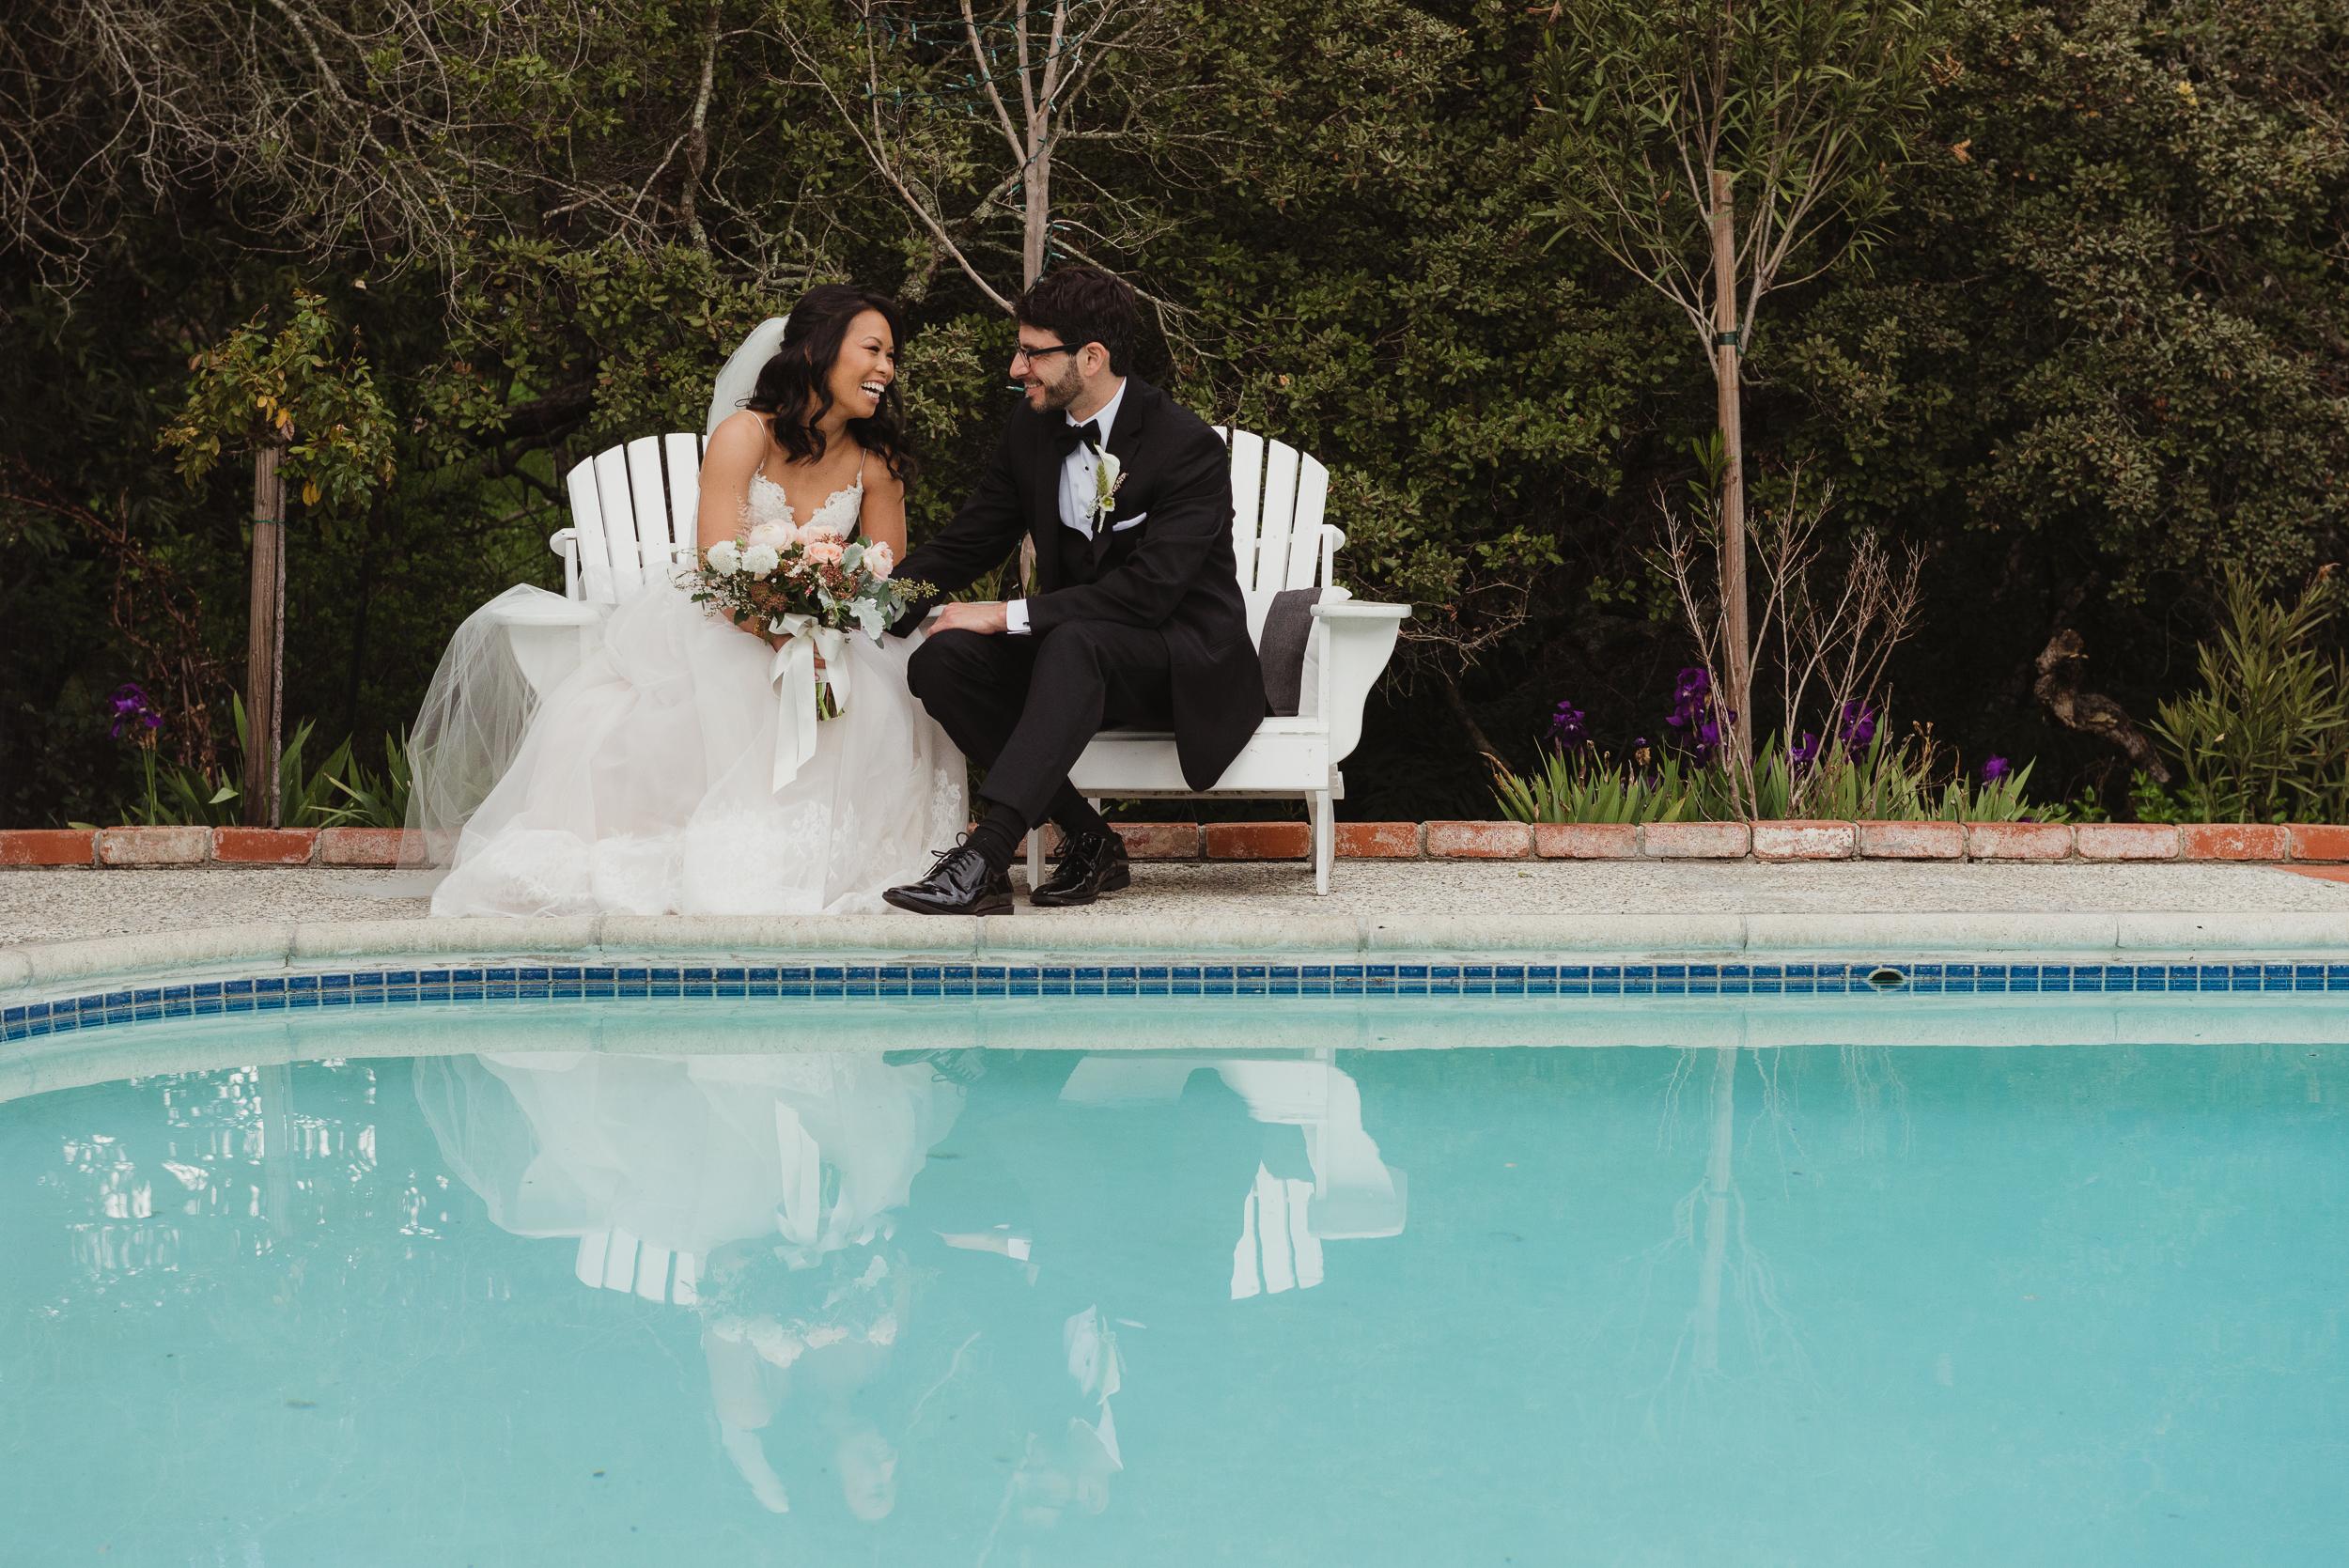 14-woodside-backyard-wedding-vivianchen-0229.jpg